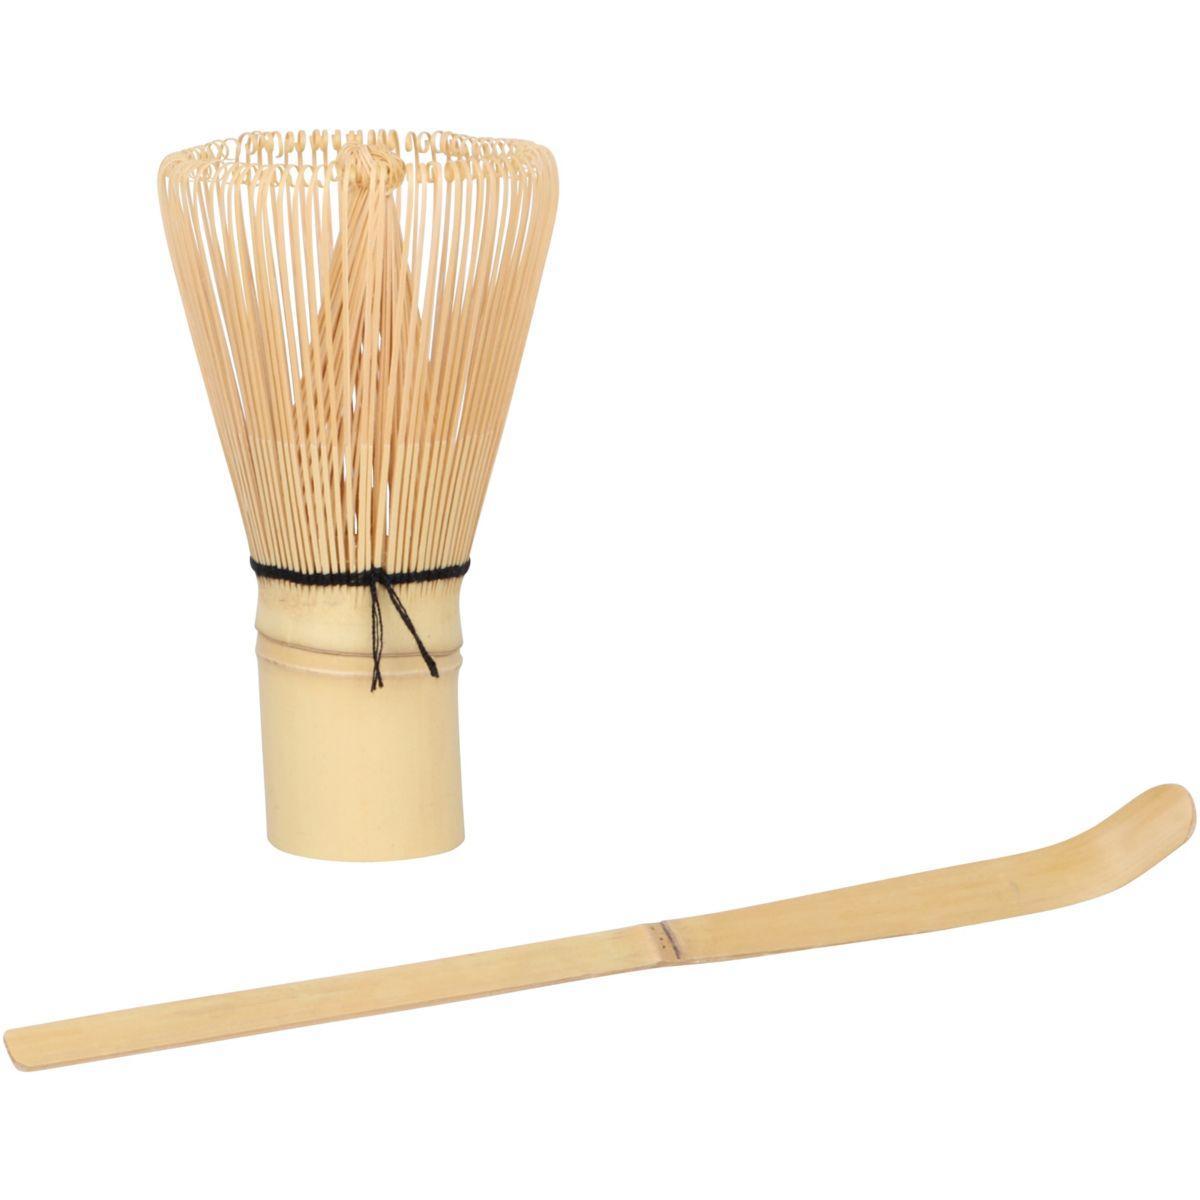 Th� chevalier diffusion fouet a matcha et spatule en bambou (photo)